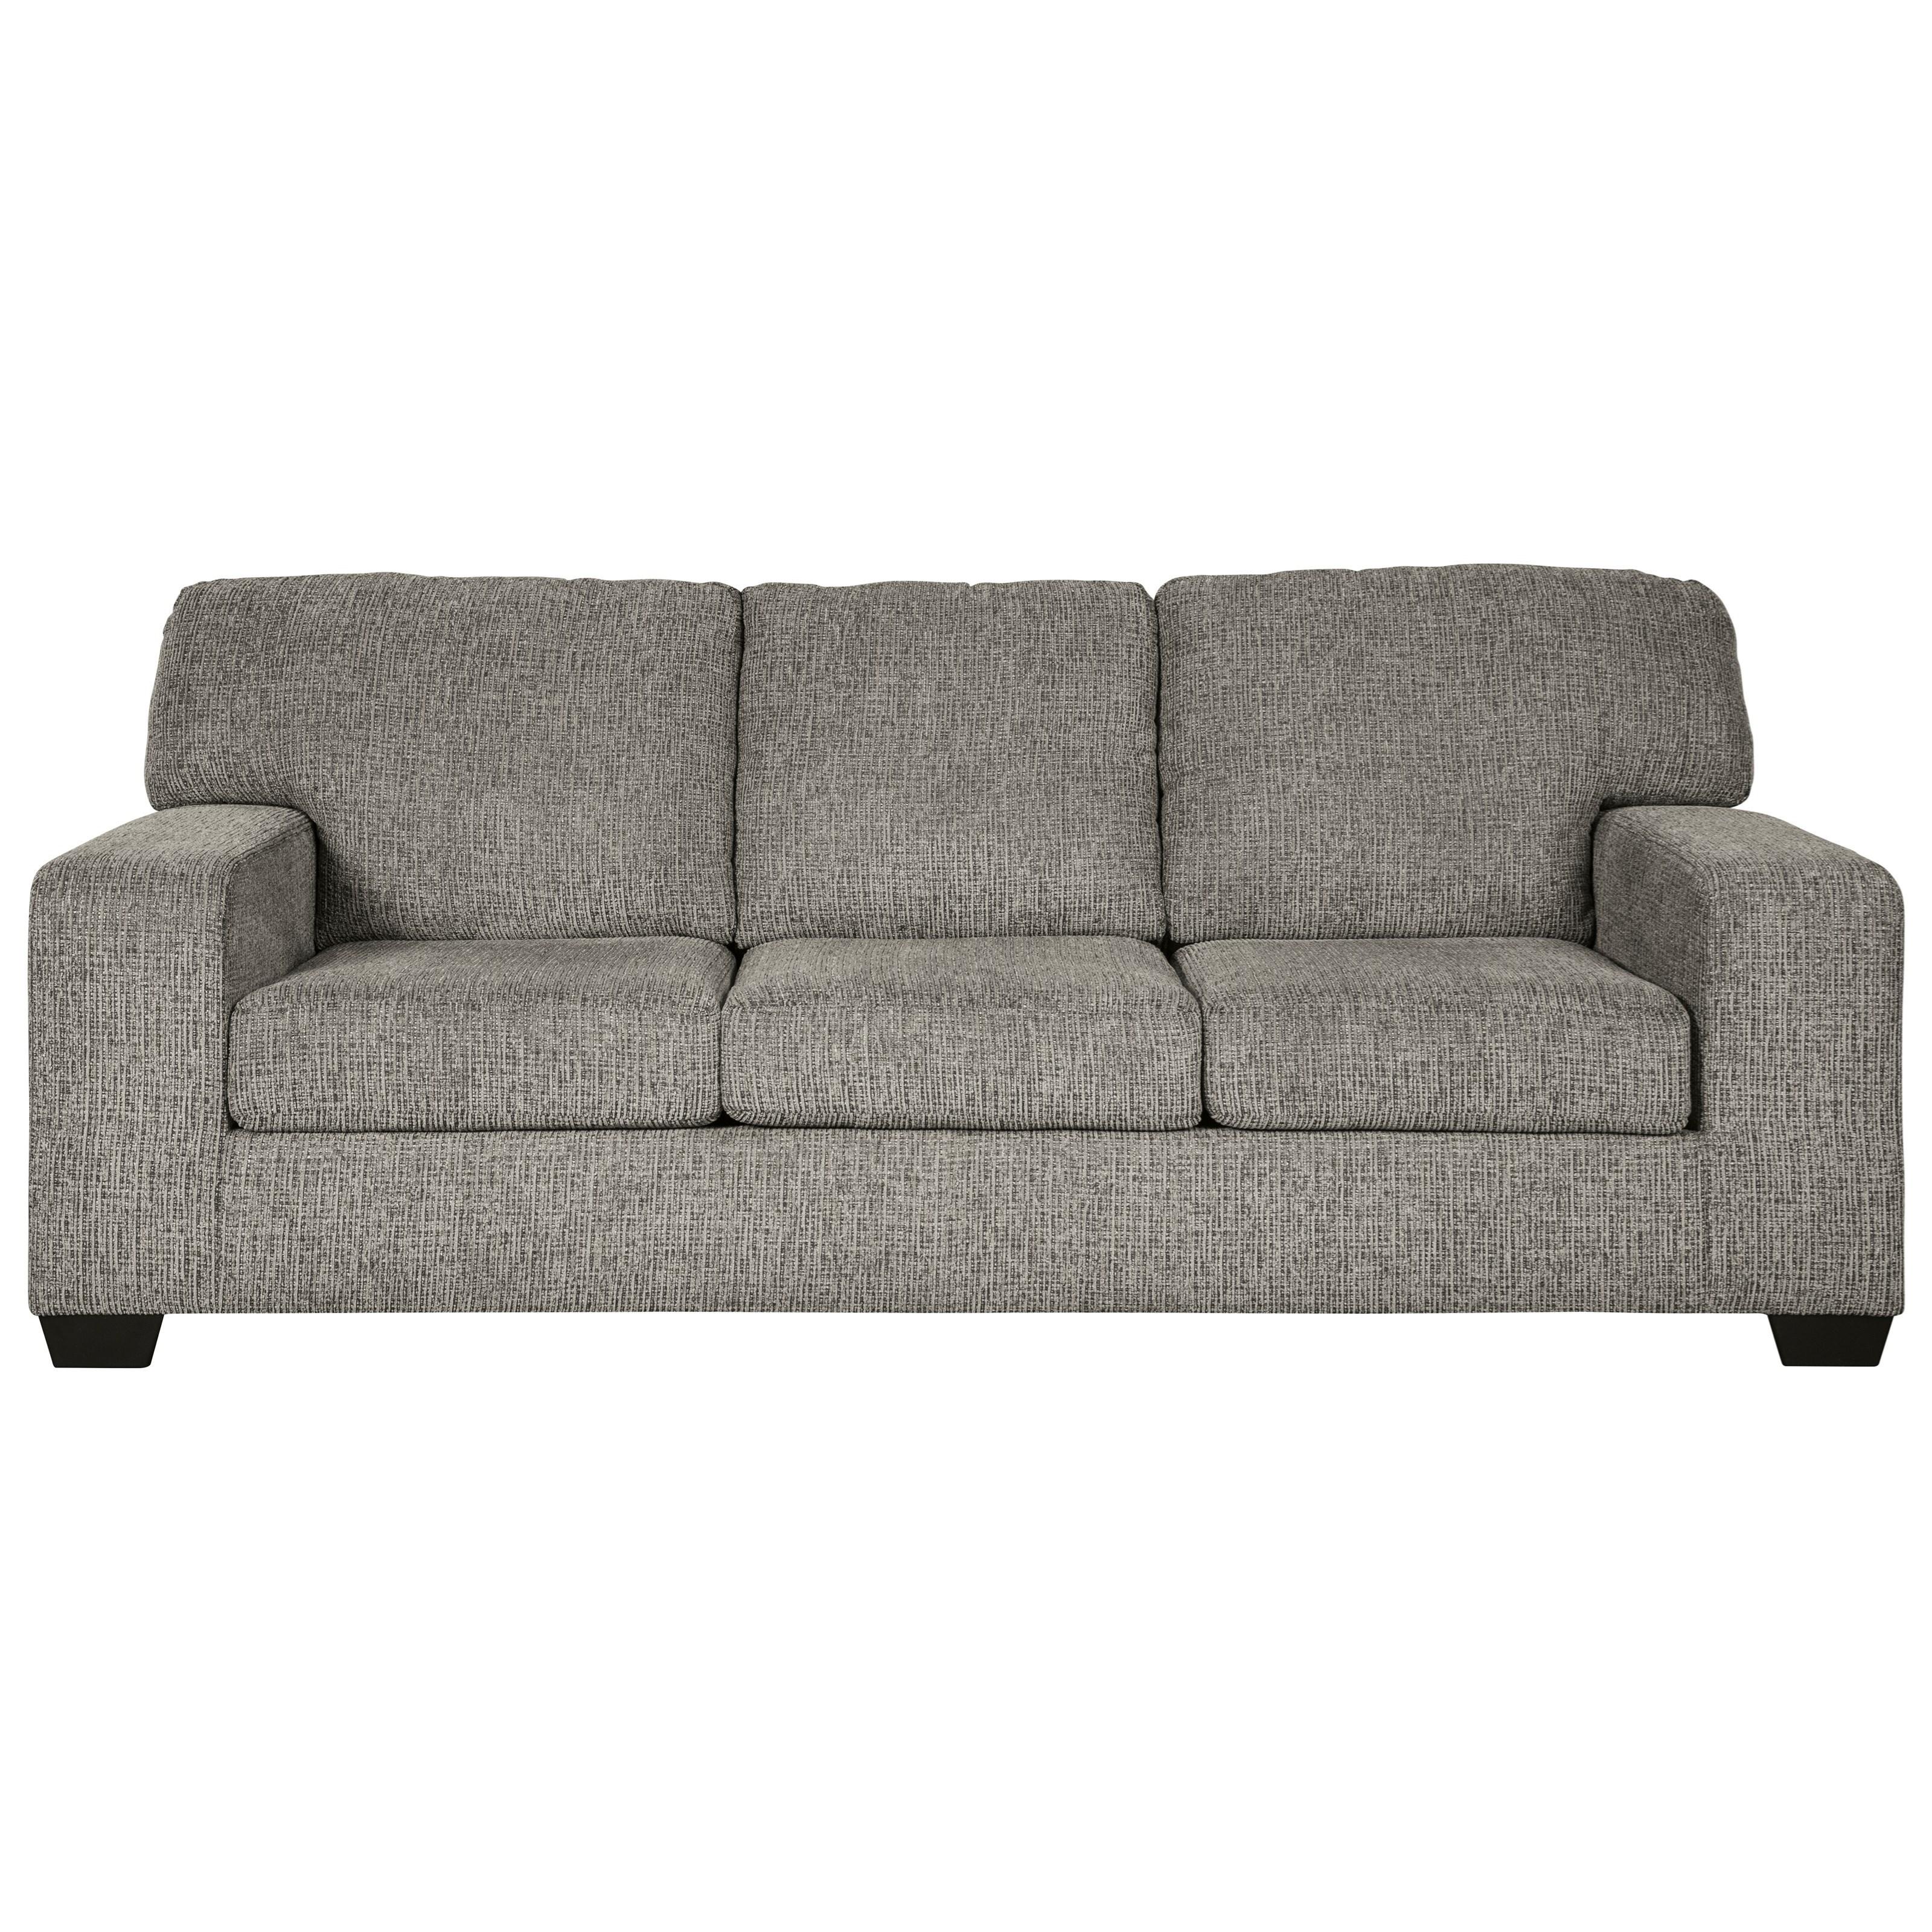 Termoli Sofa by Ashley (Signature Design) at Johnny Janosik